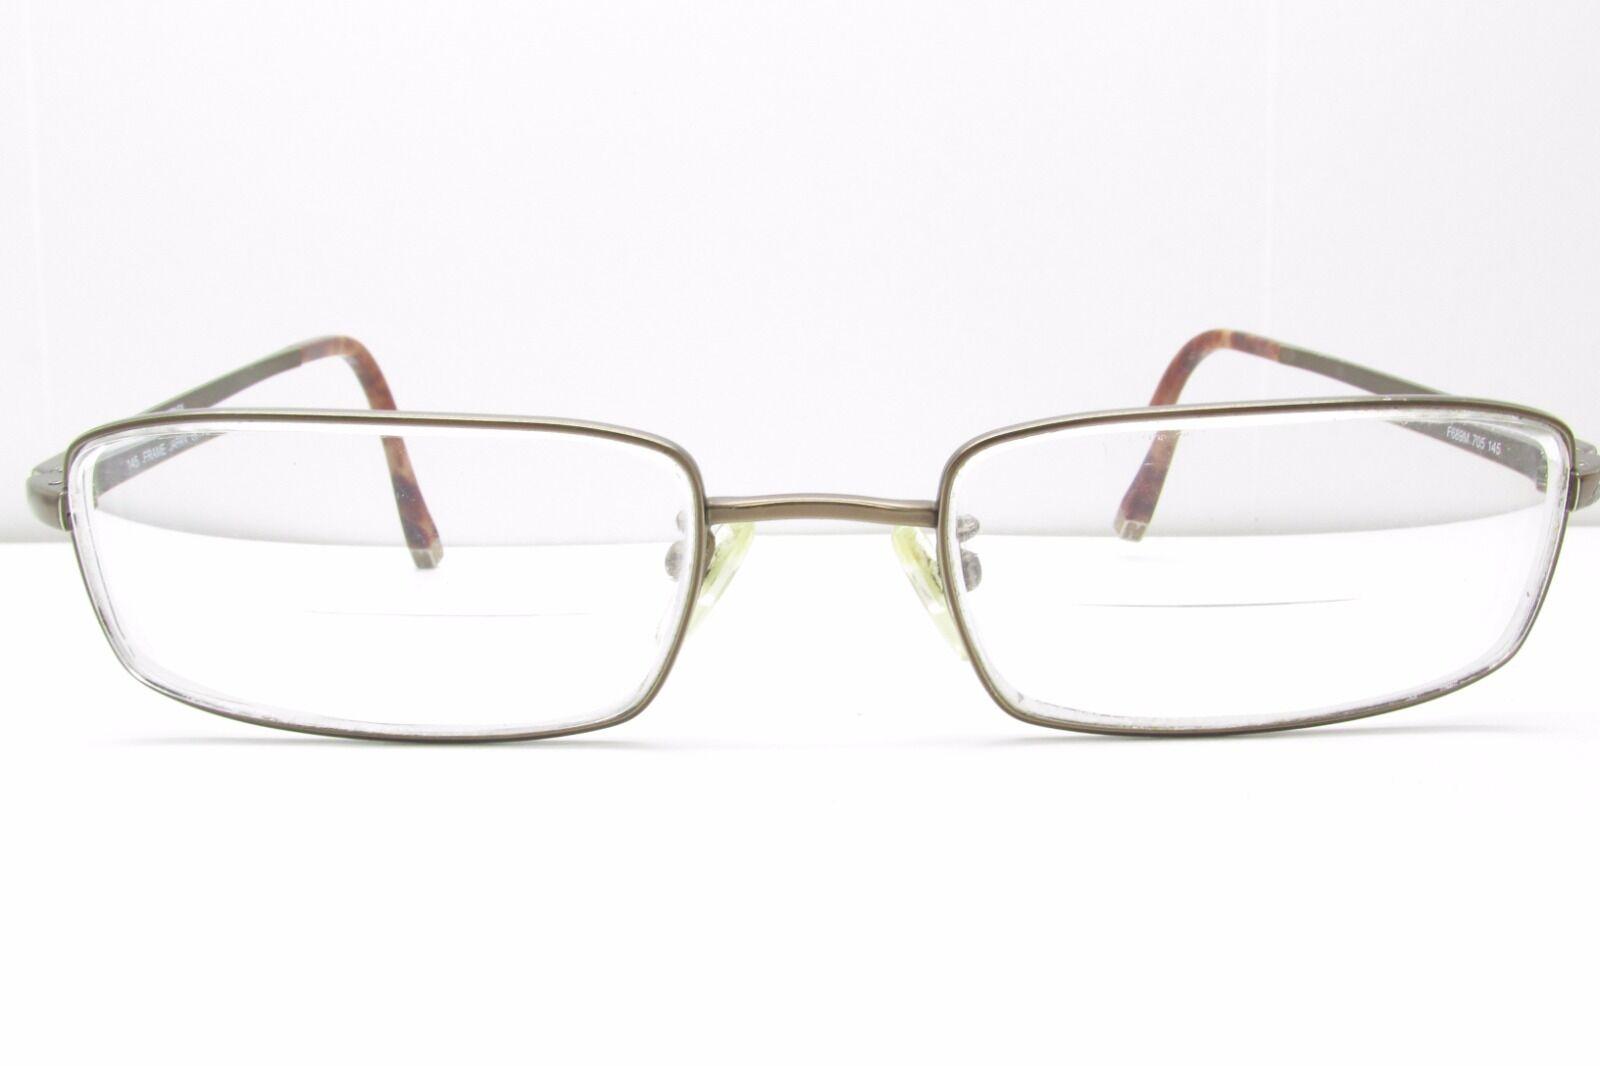 Fendi F689m 705 Rectangular Eyeglasses Eyewear Frames 53-19-145 Tv6 ...